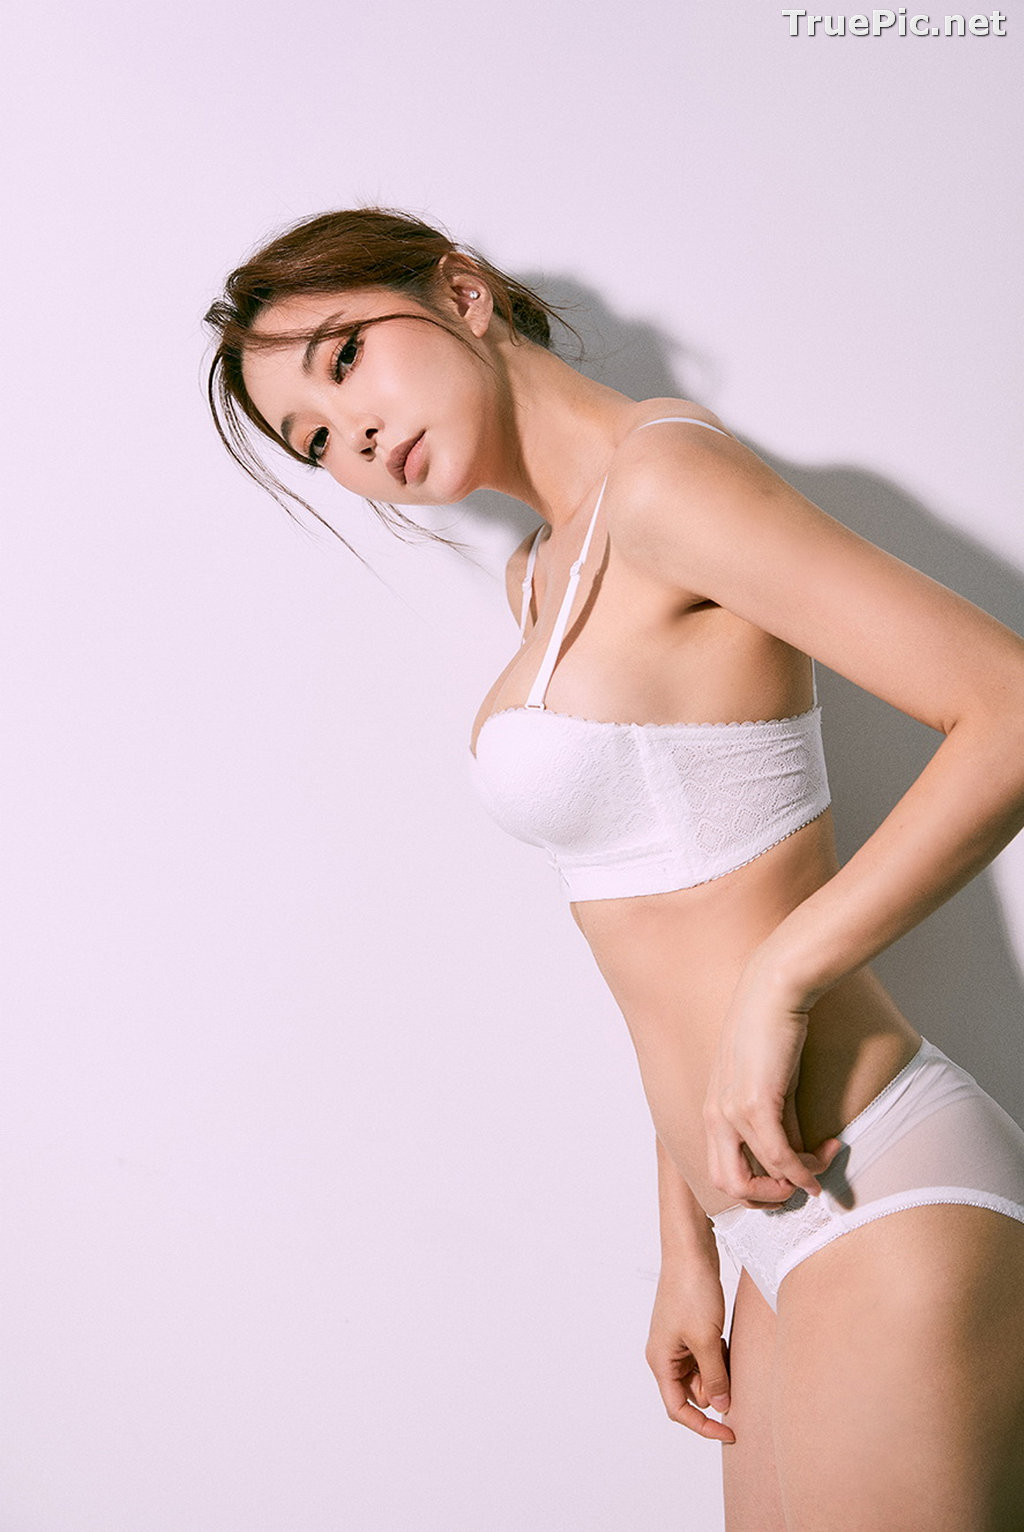 Image Korean Fashion Model - Park Soo Yeon - Open Up Lingerie - TruePic.net - Picture-7